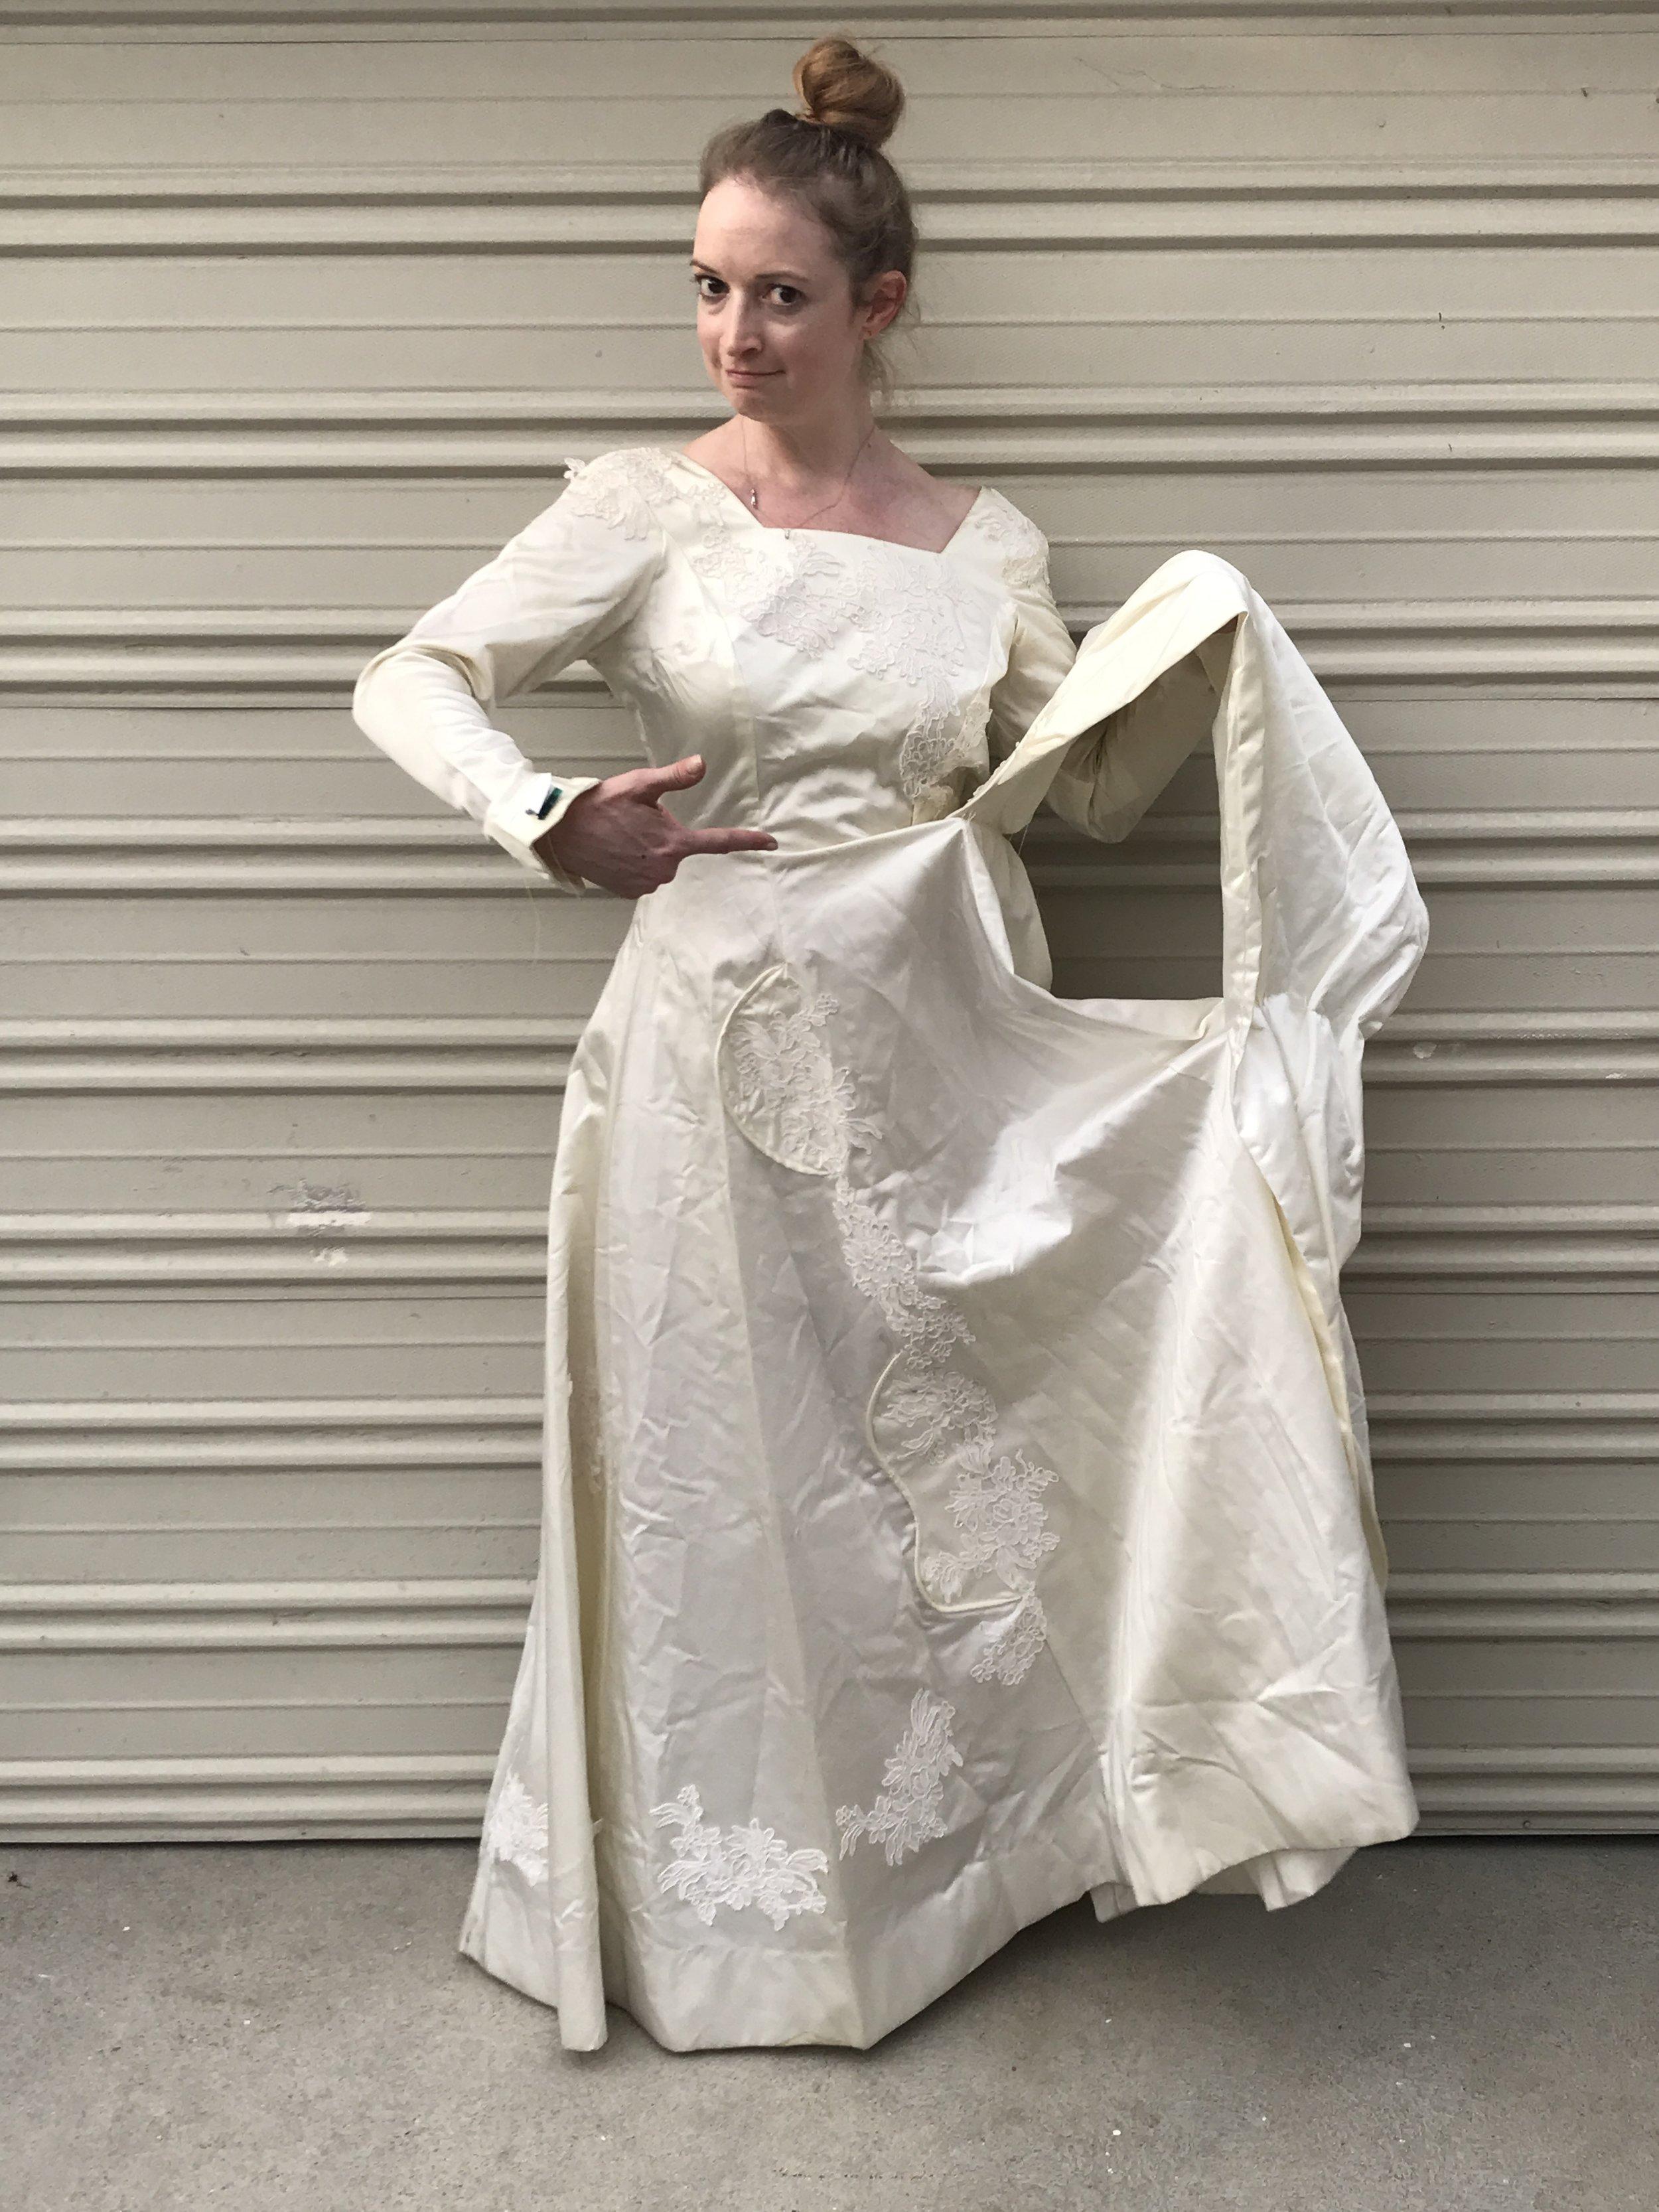 NDAD - Day 25 - Vintage Wedding Dress